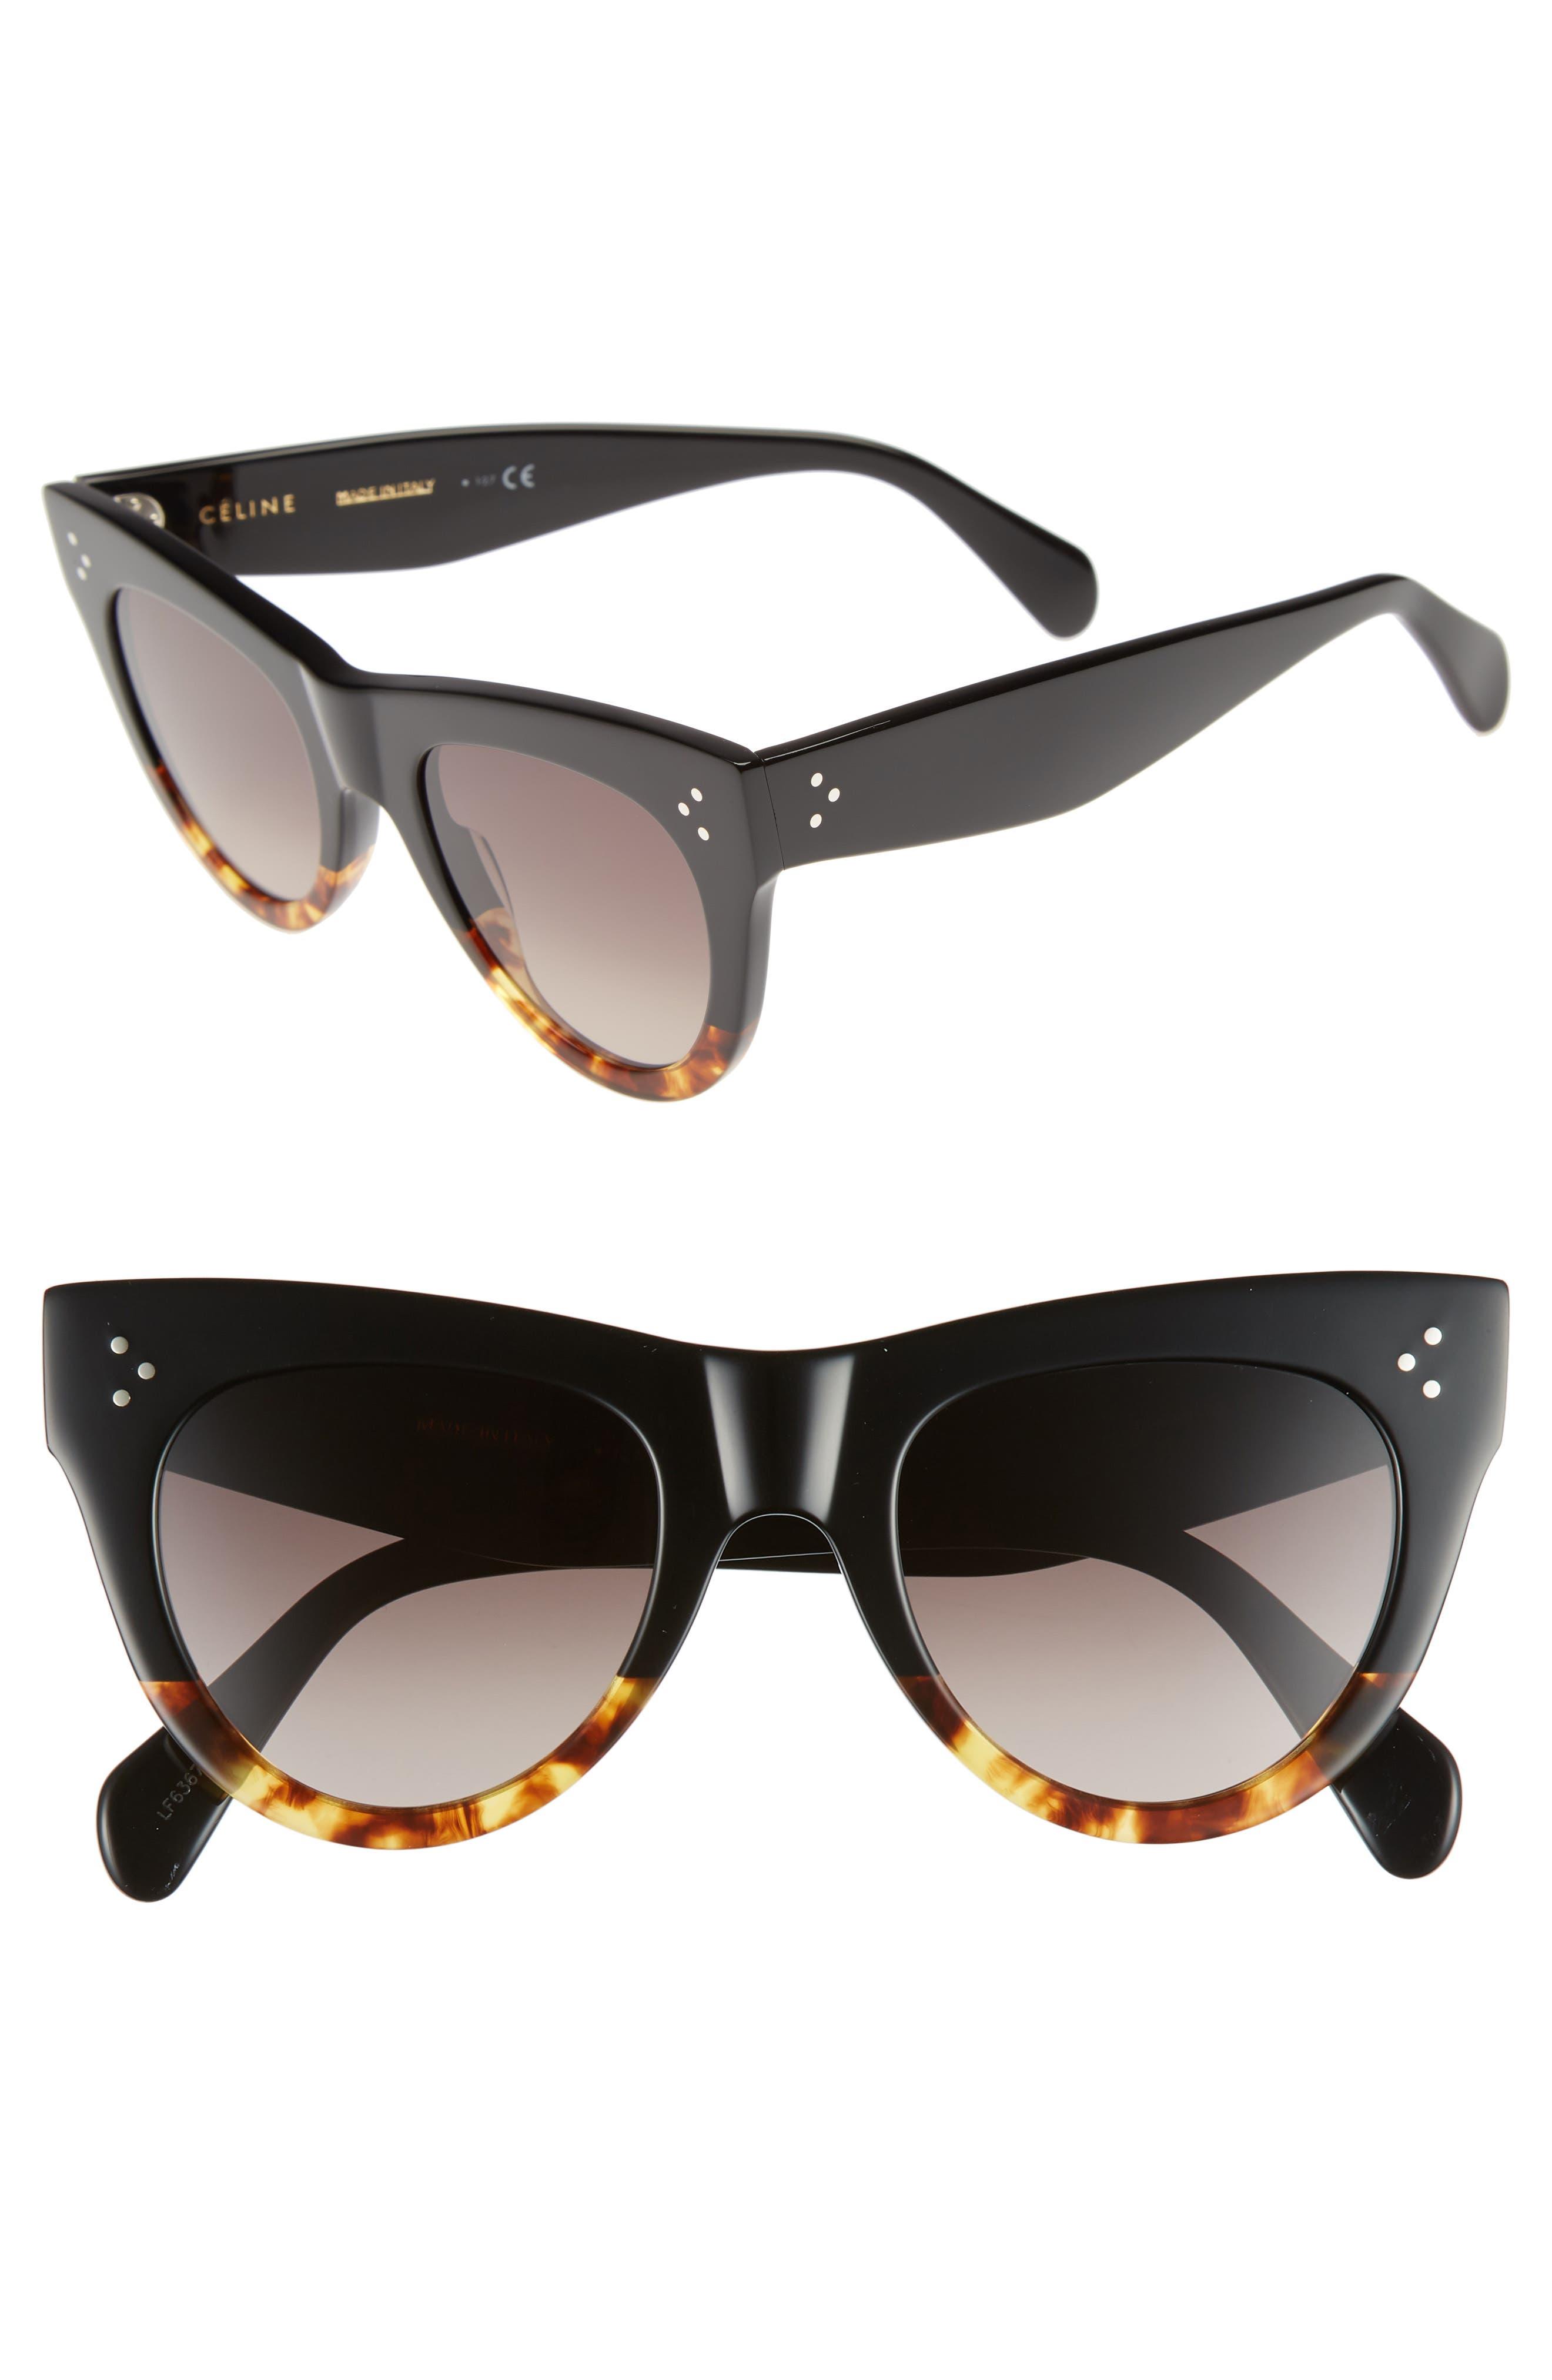 5bf028a3733 CELINE Sunglasses  Audrey